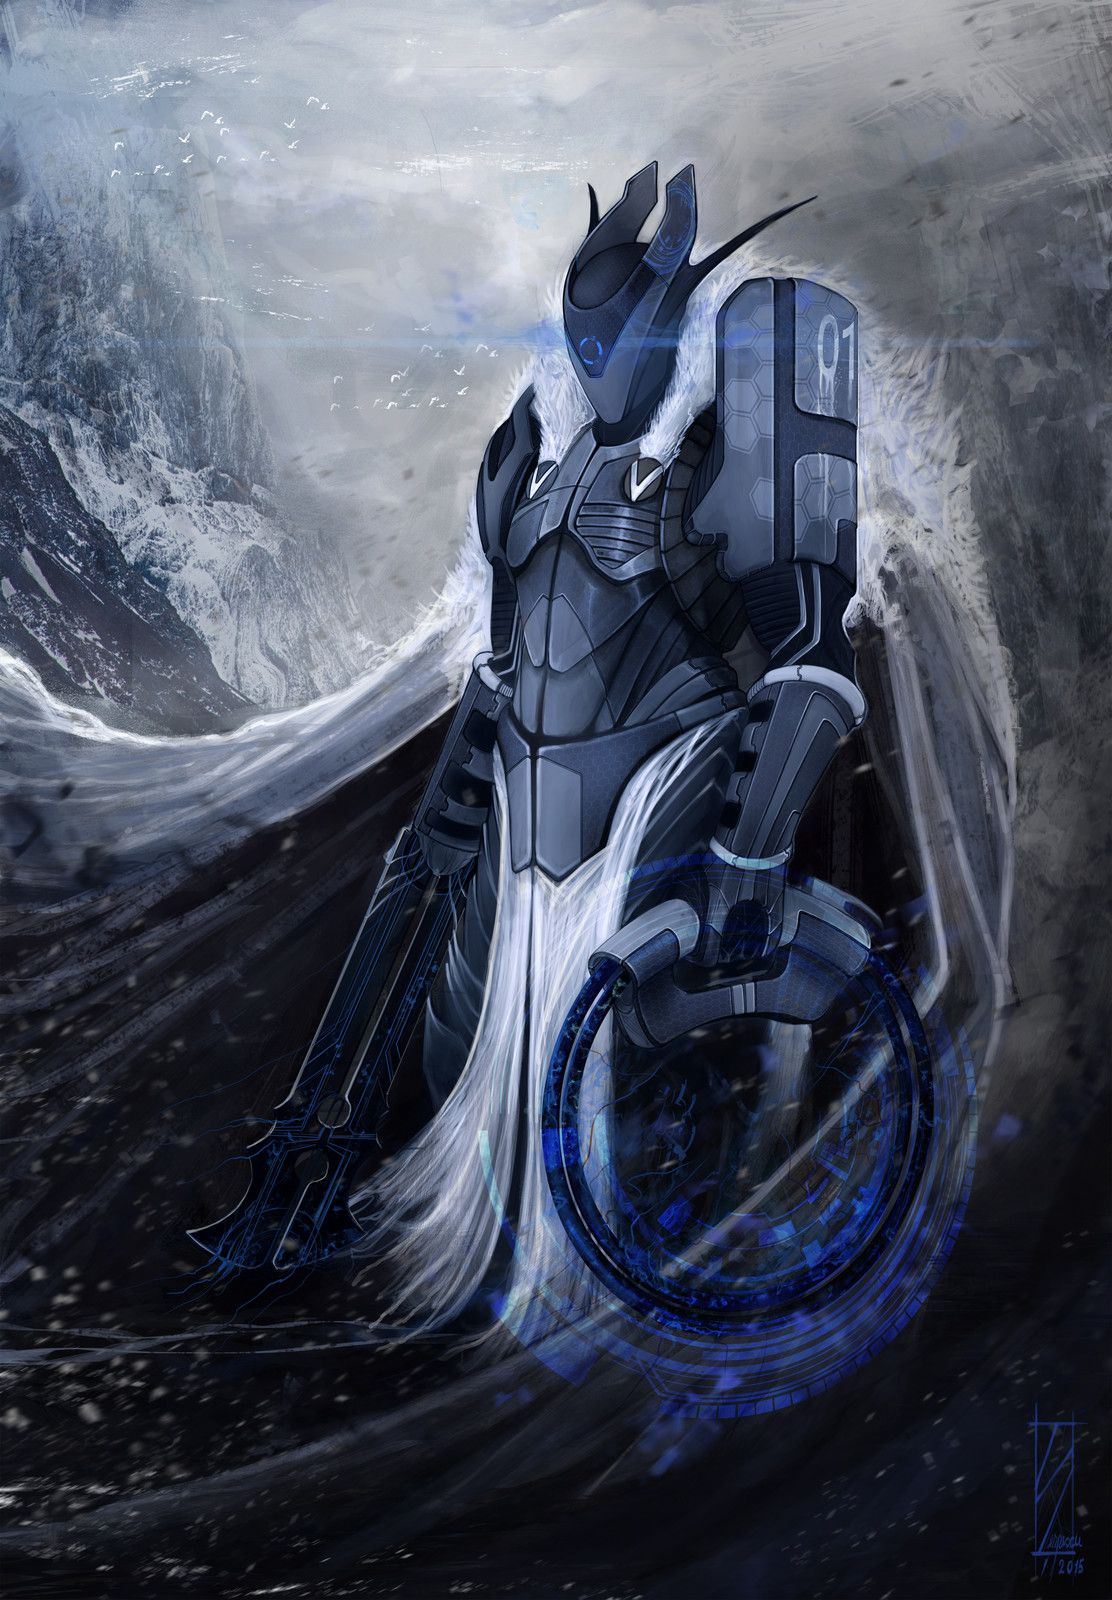 Carbon-Fiber Viking, Serpescu Razvan on ArtStation at https://www.artstation.com/artwork/mO9qv